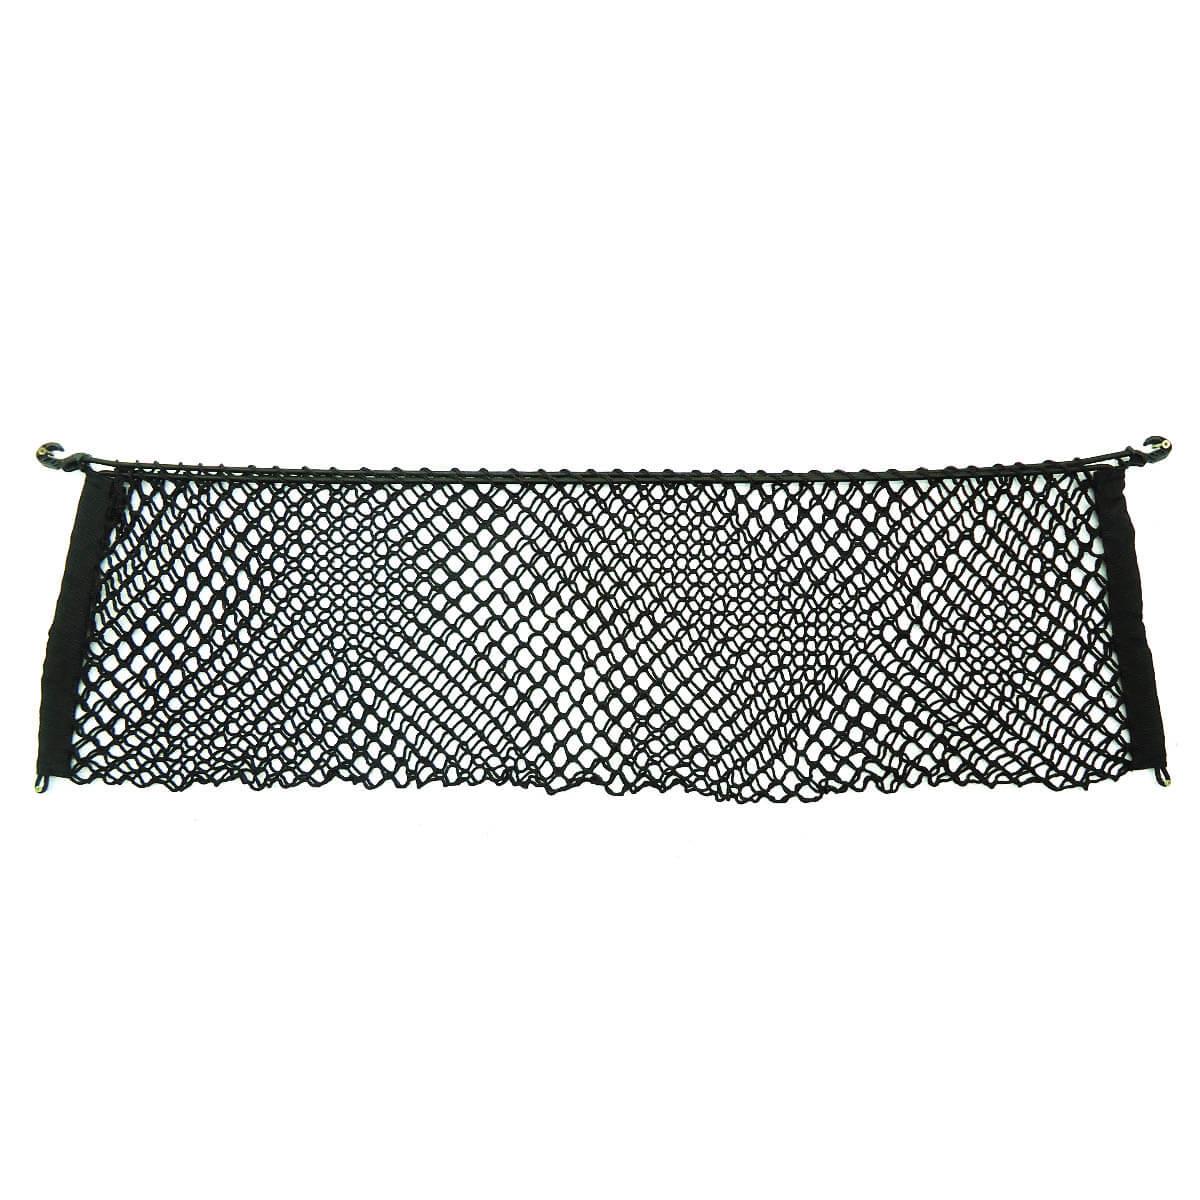 Rede de carga para caçamba de pick ups uso universal